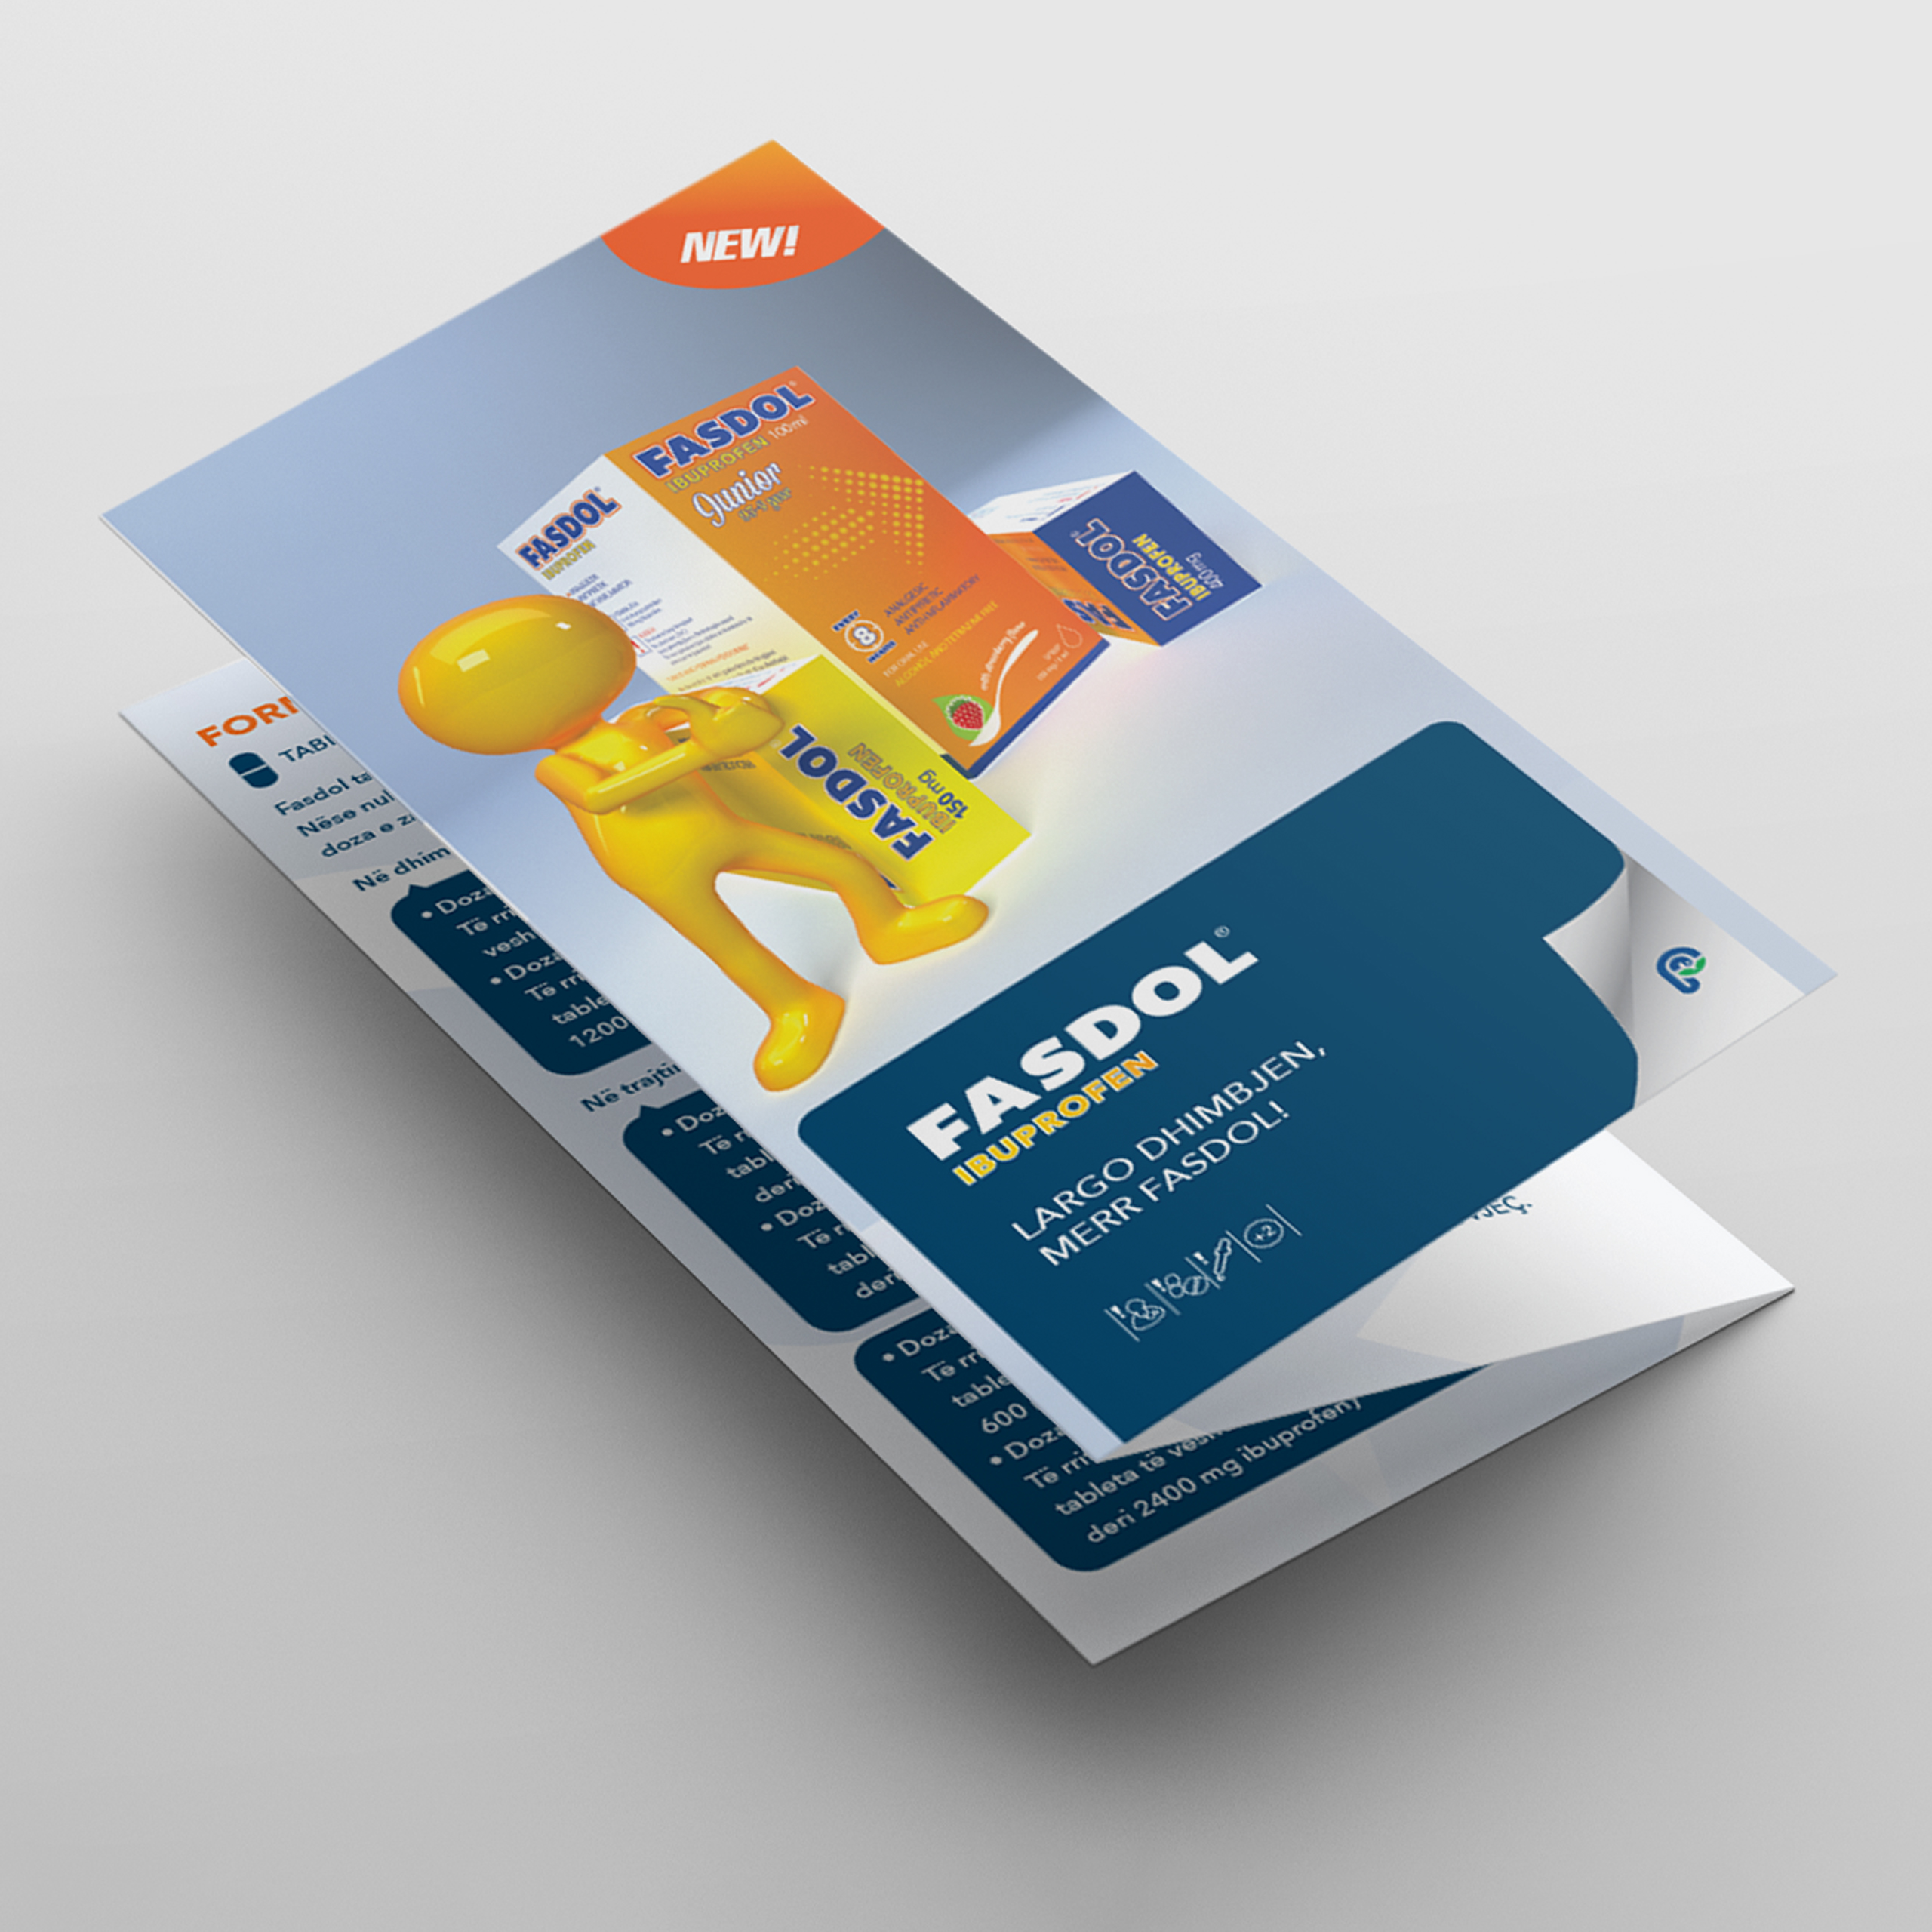 Profarma, Project Img 26 - Vatra Agency / Founder & CEO Gerton Bejo